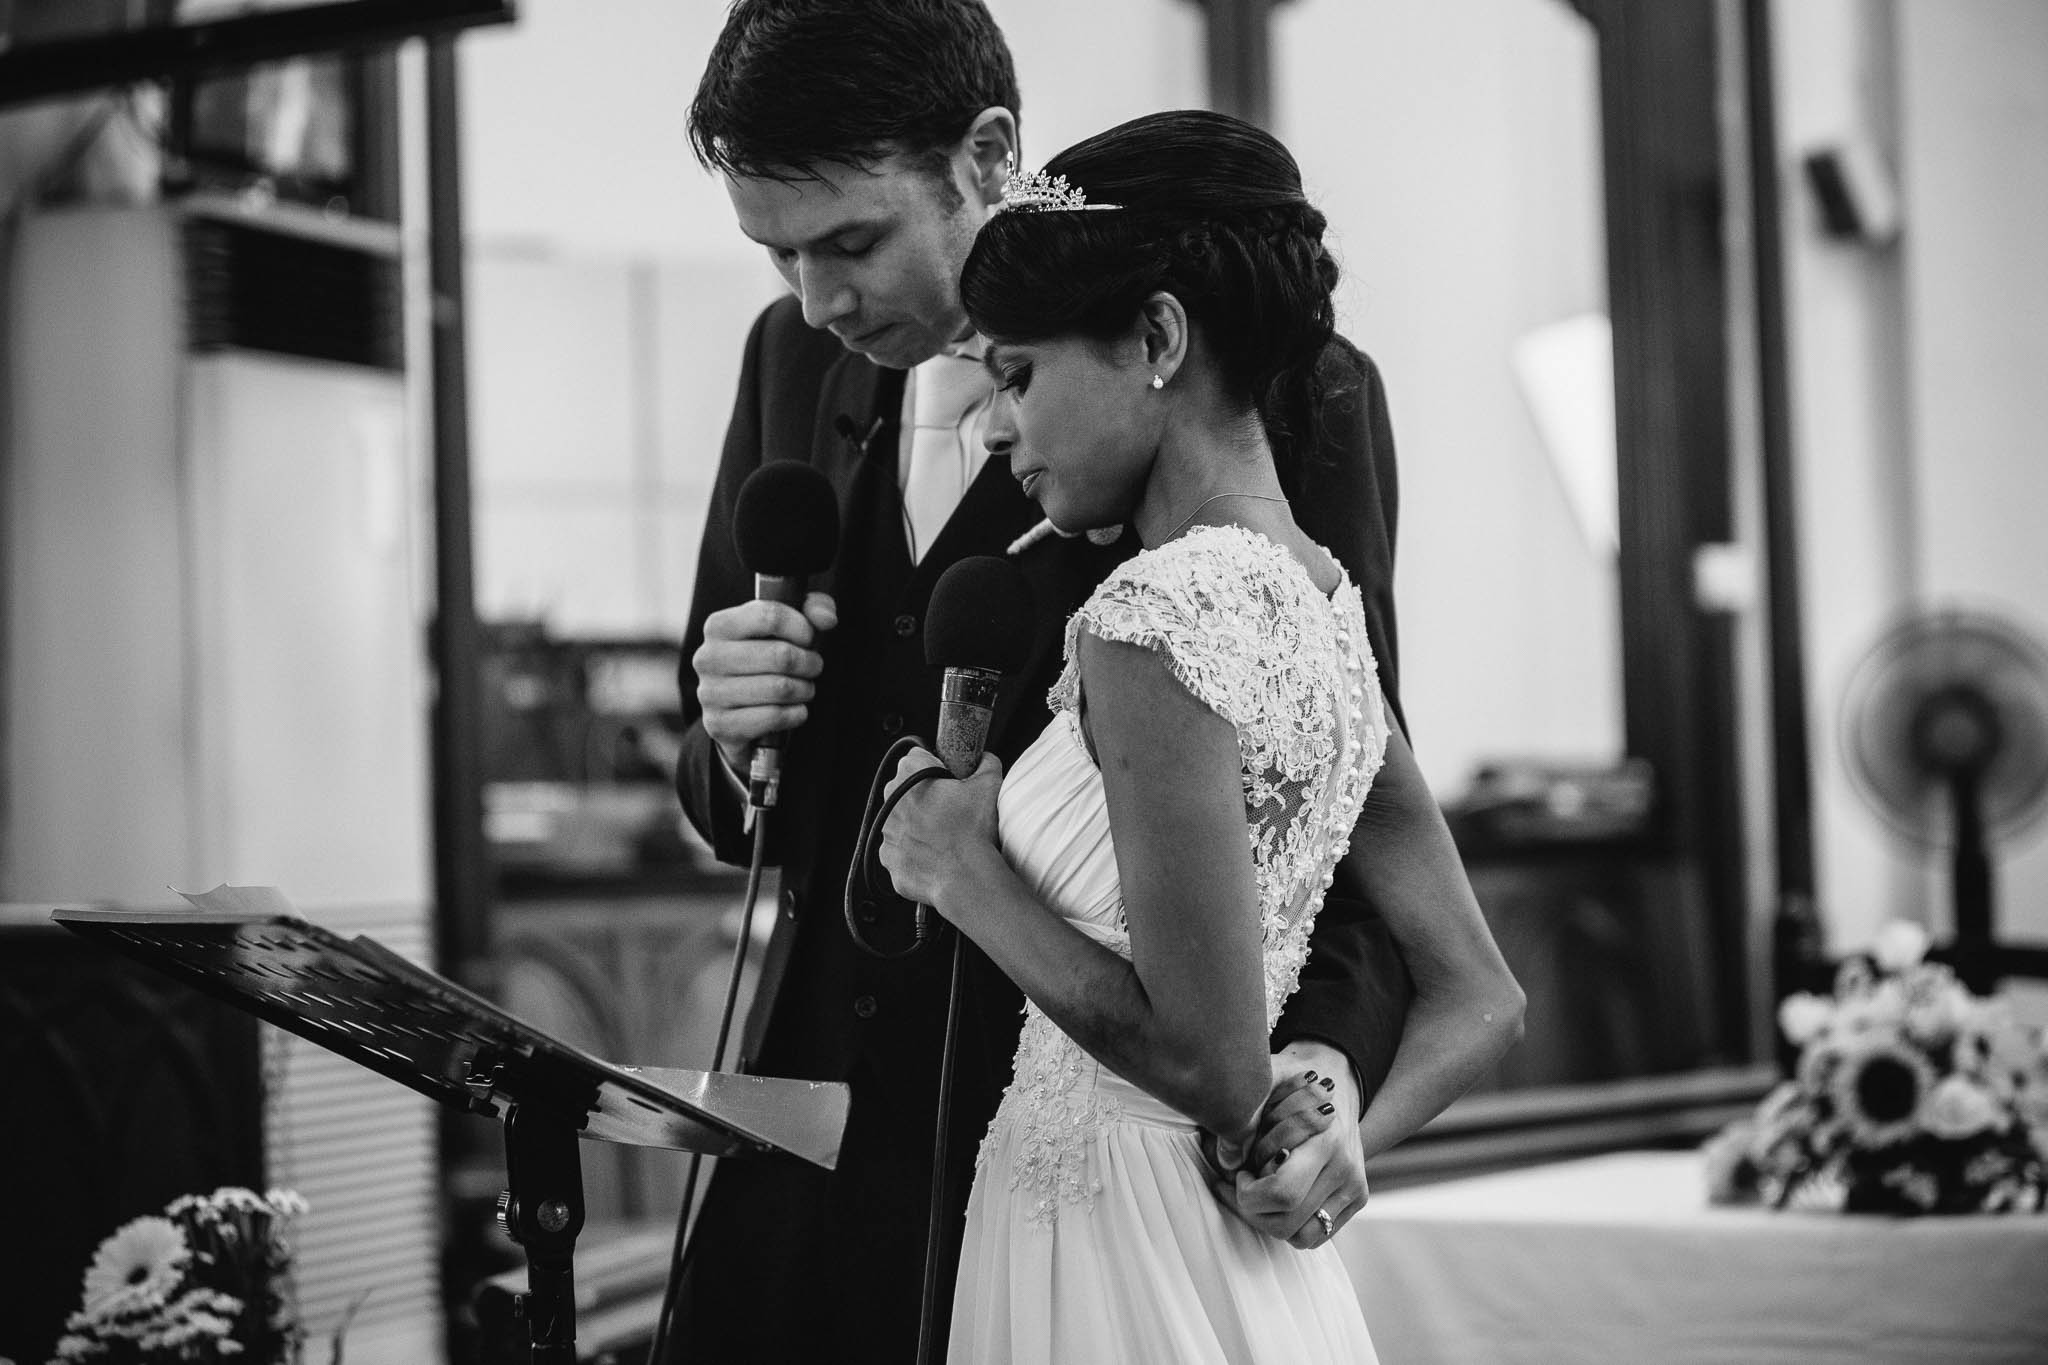 singapore-wedding-photographer-st-andrews-cathedral-renita-david-27.jpg